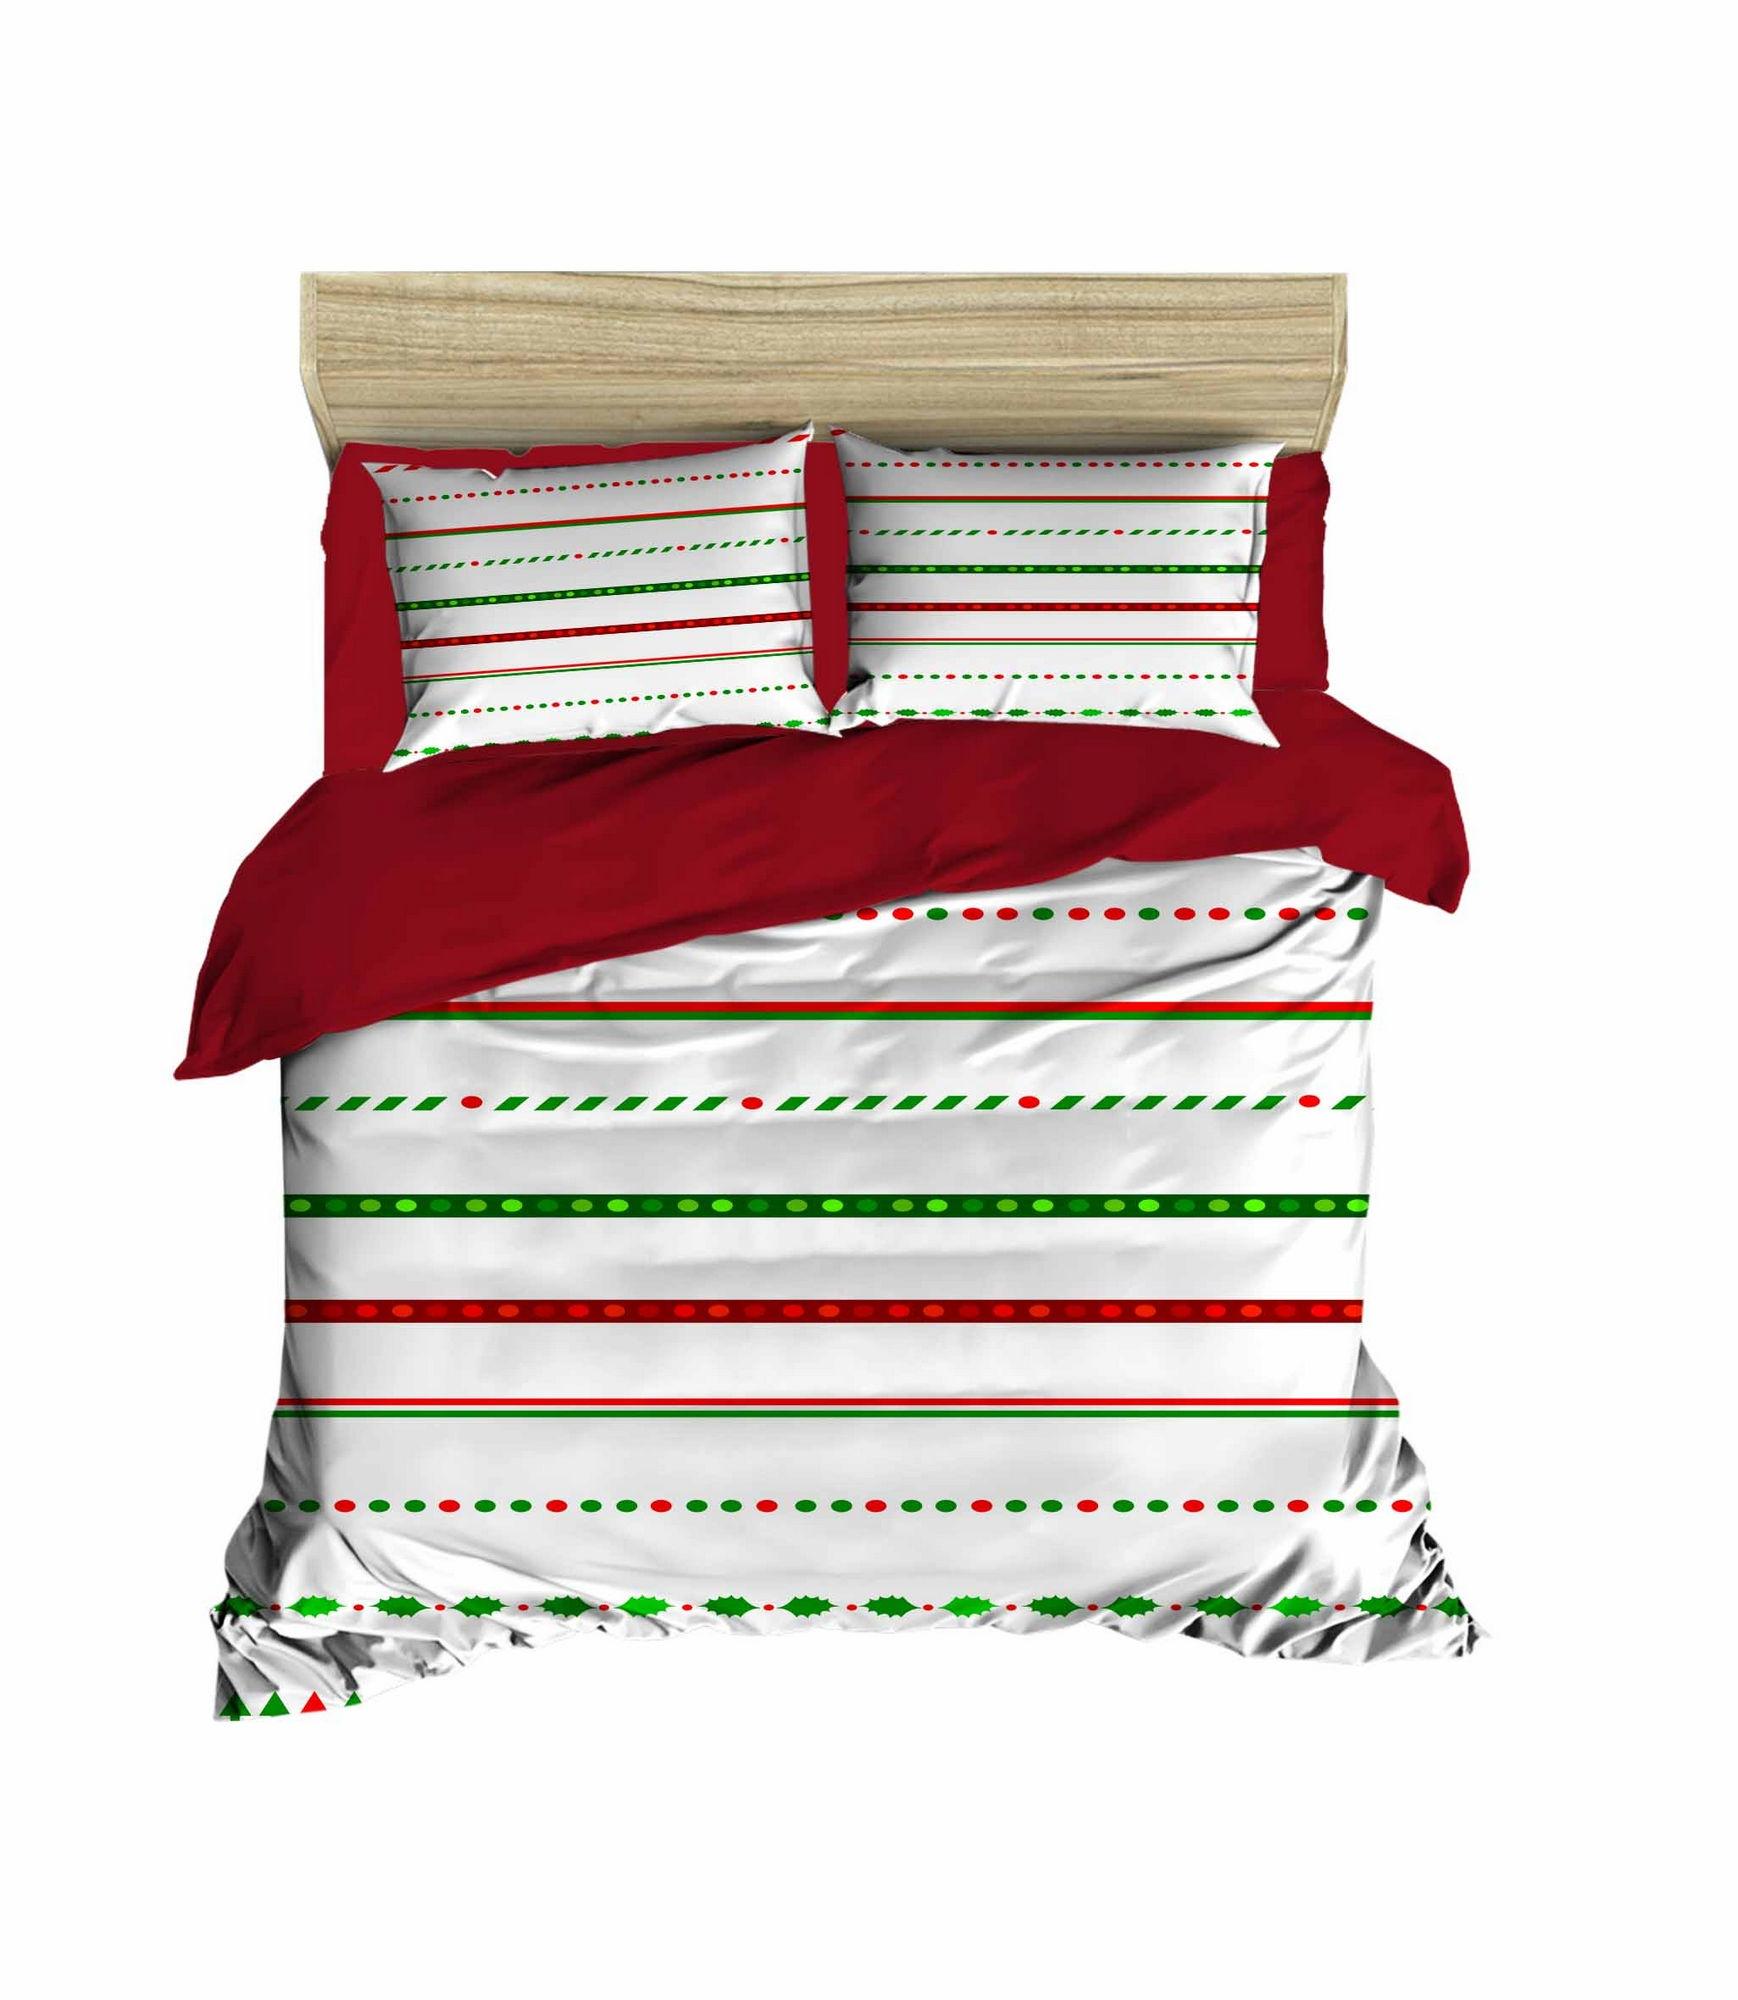 Lenjerie de pat din bumbac si microfibra Christmas 458 Multicolor, 200 x 220 cm